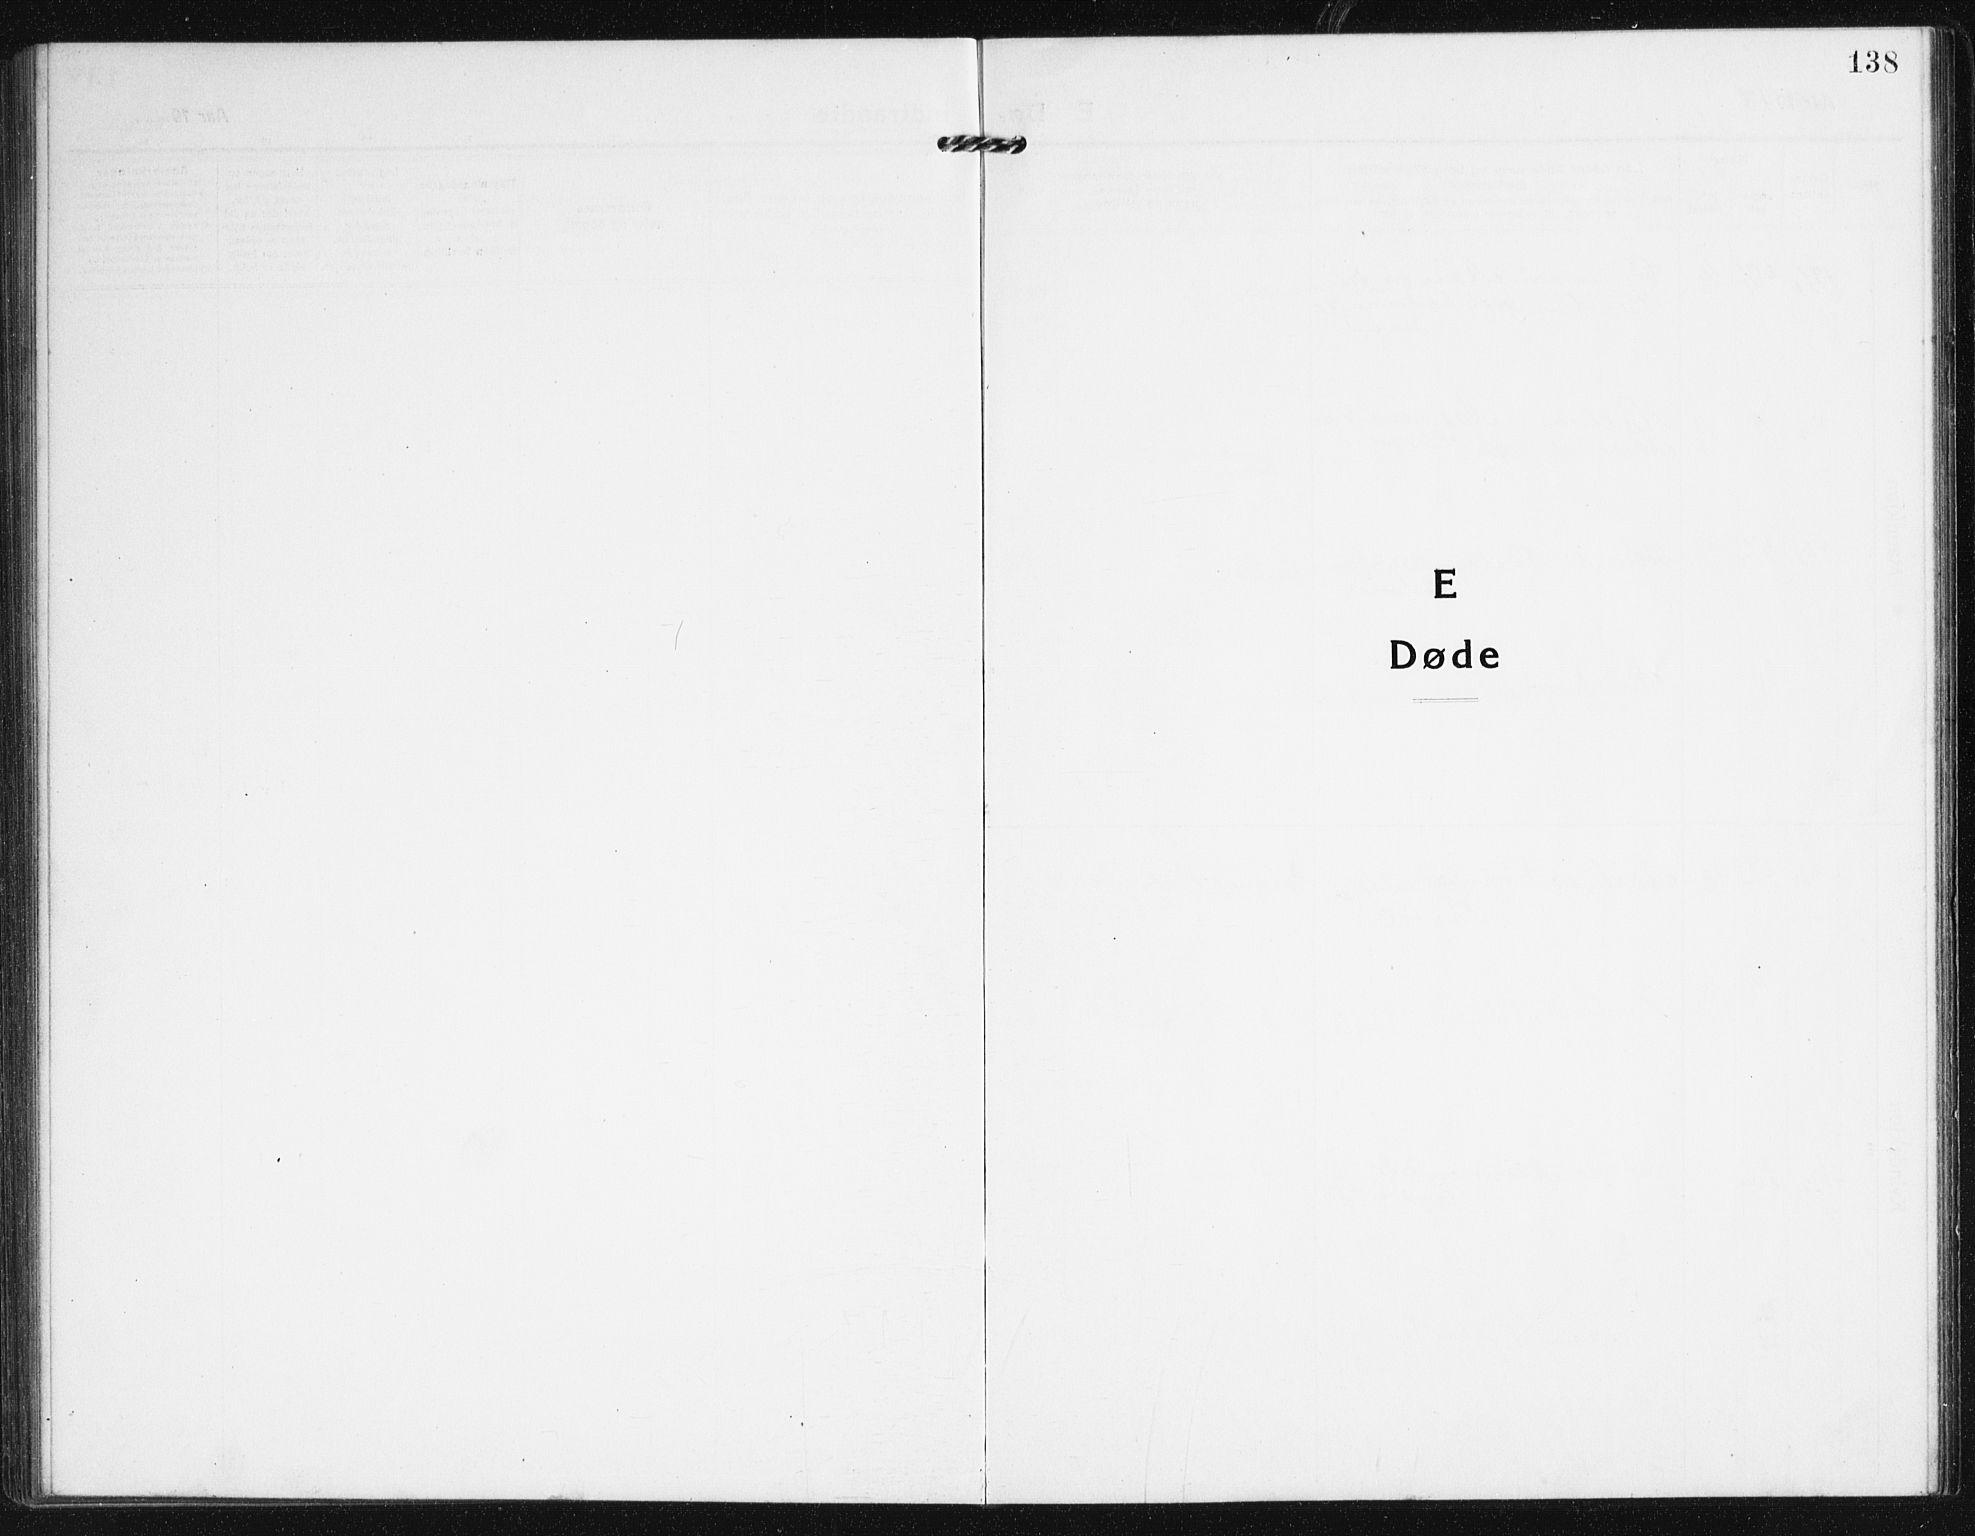 SAK, Valle sokneprestkontor, F/Fb/Fba/L0004: Klokkerbok nr. B 4, 1917-1944, s. 138